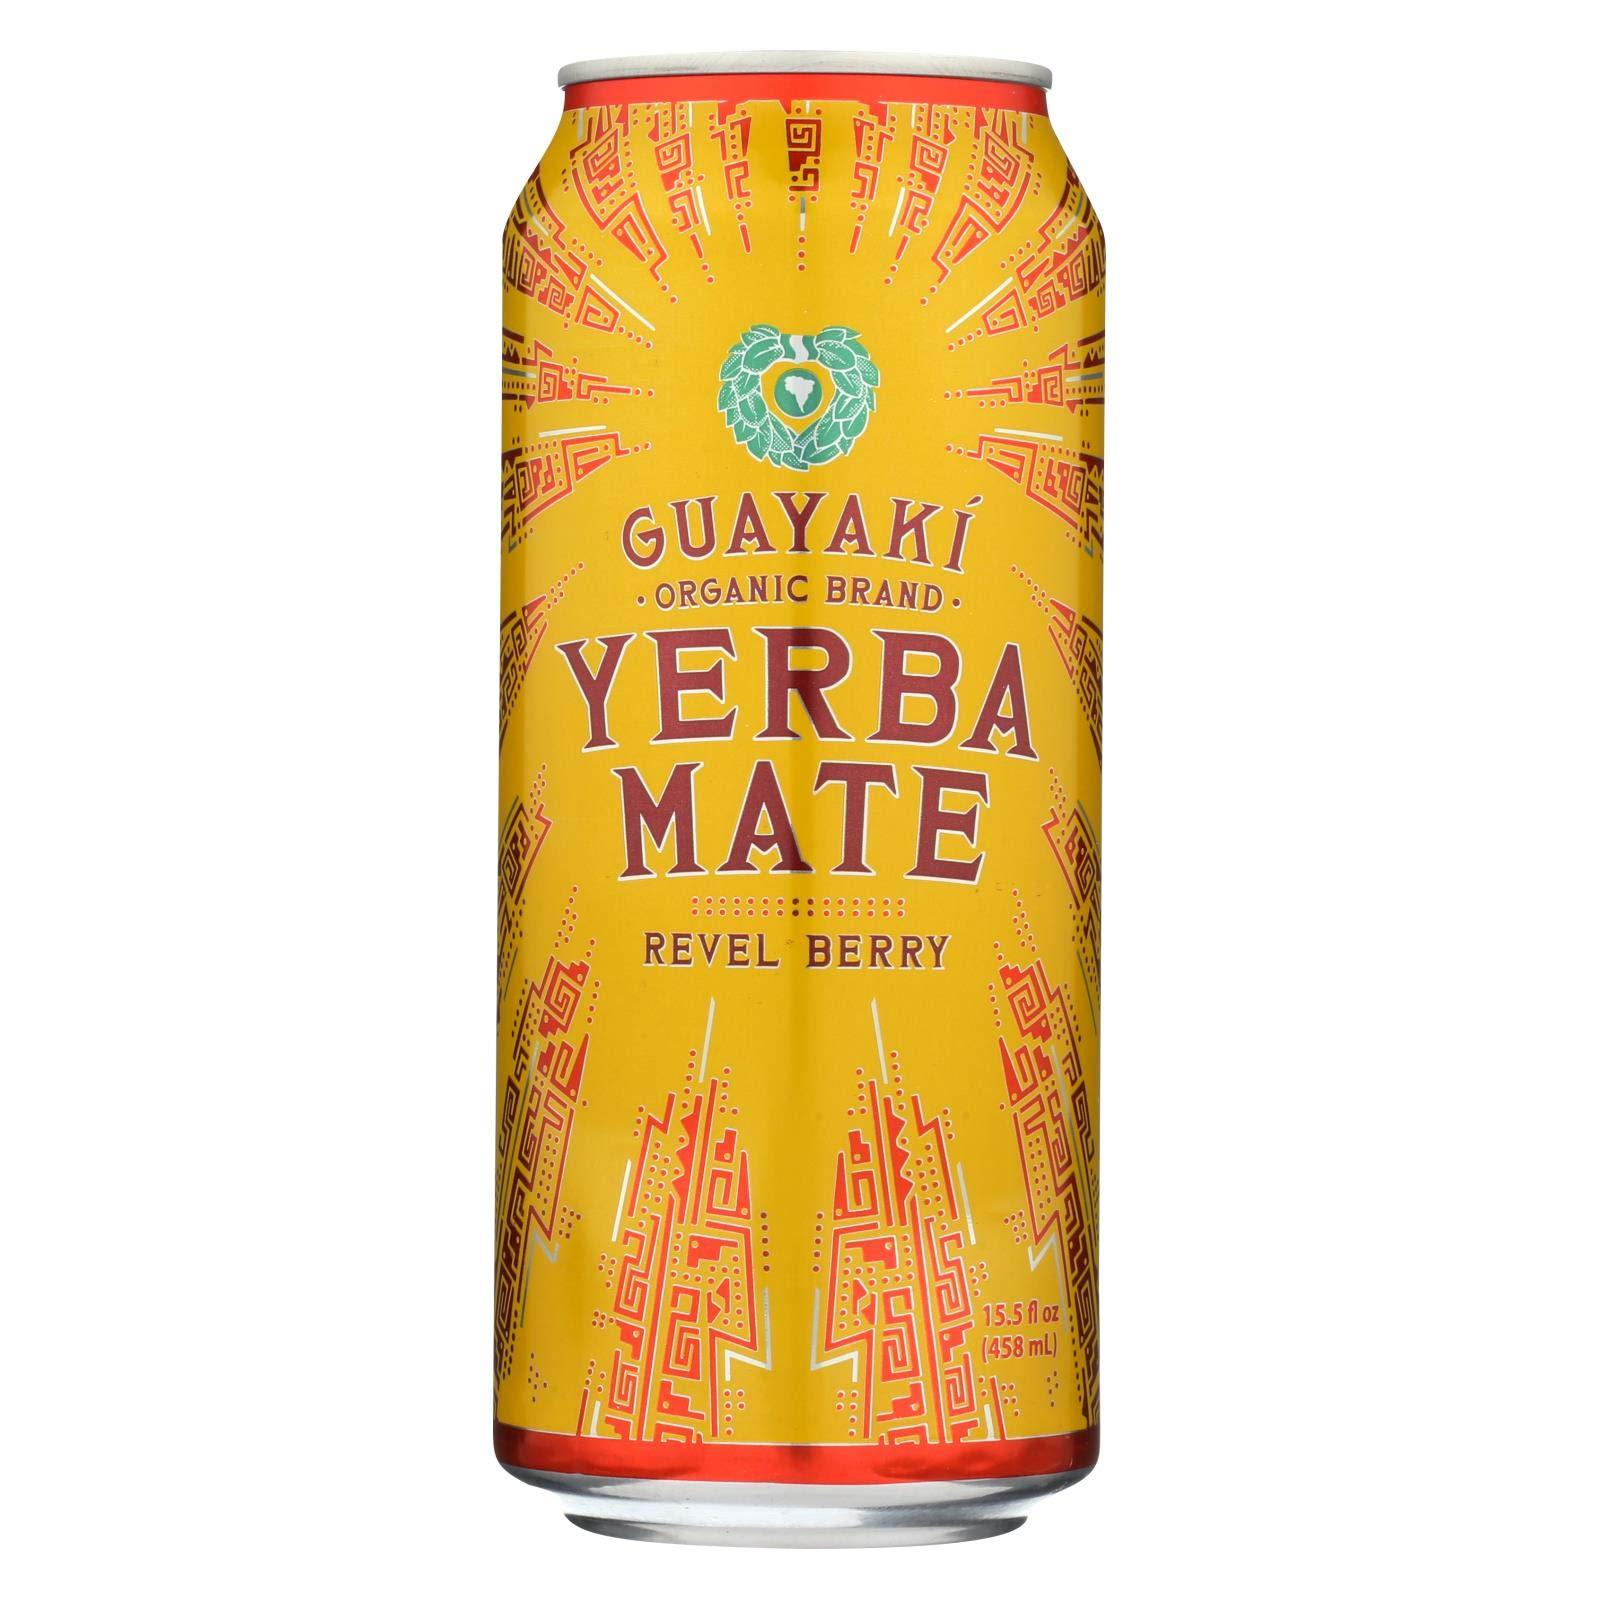 Guayaki Yerba Mate - Revel Berry - Case of 12 - 15.5 Fl oz. by Guayaki